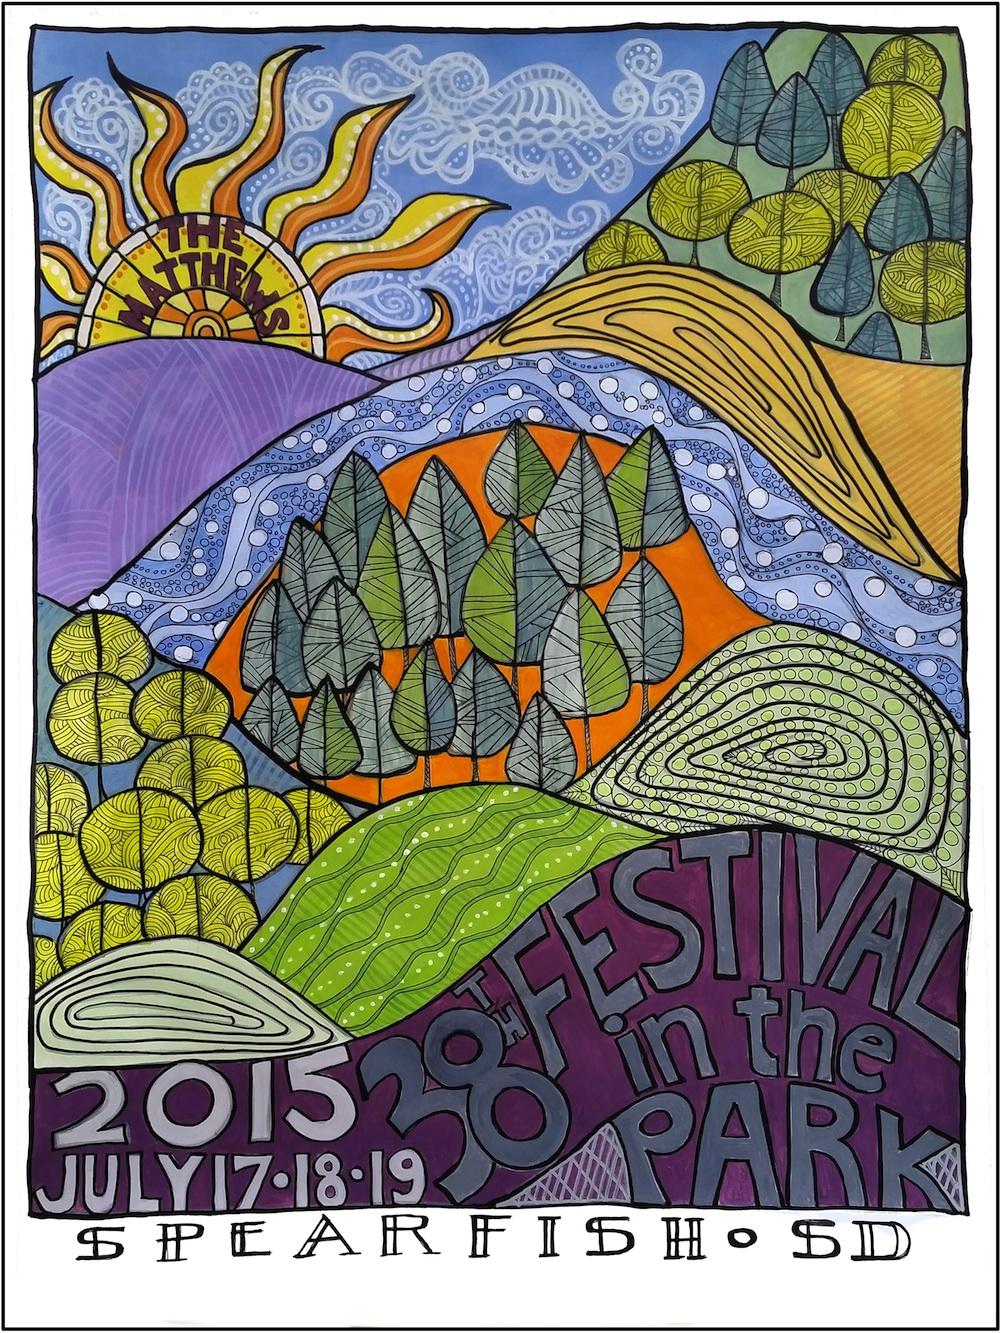 2015 Festival in the Park Commemorative Poster